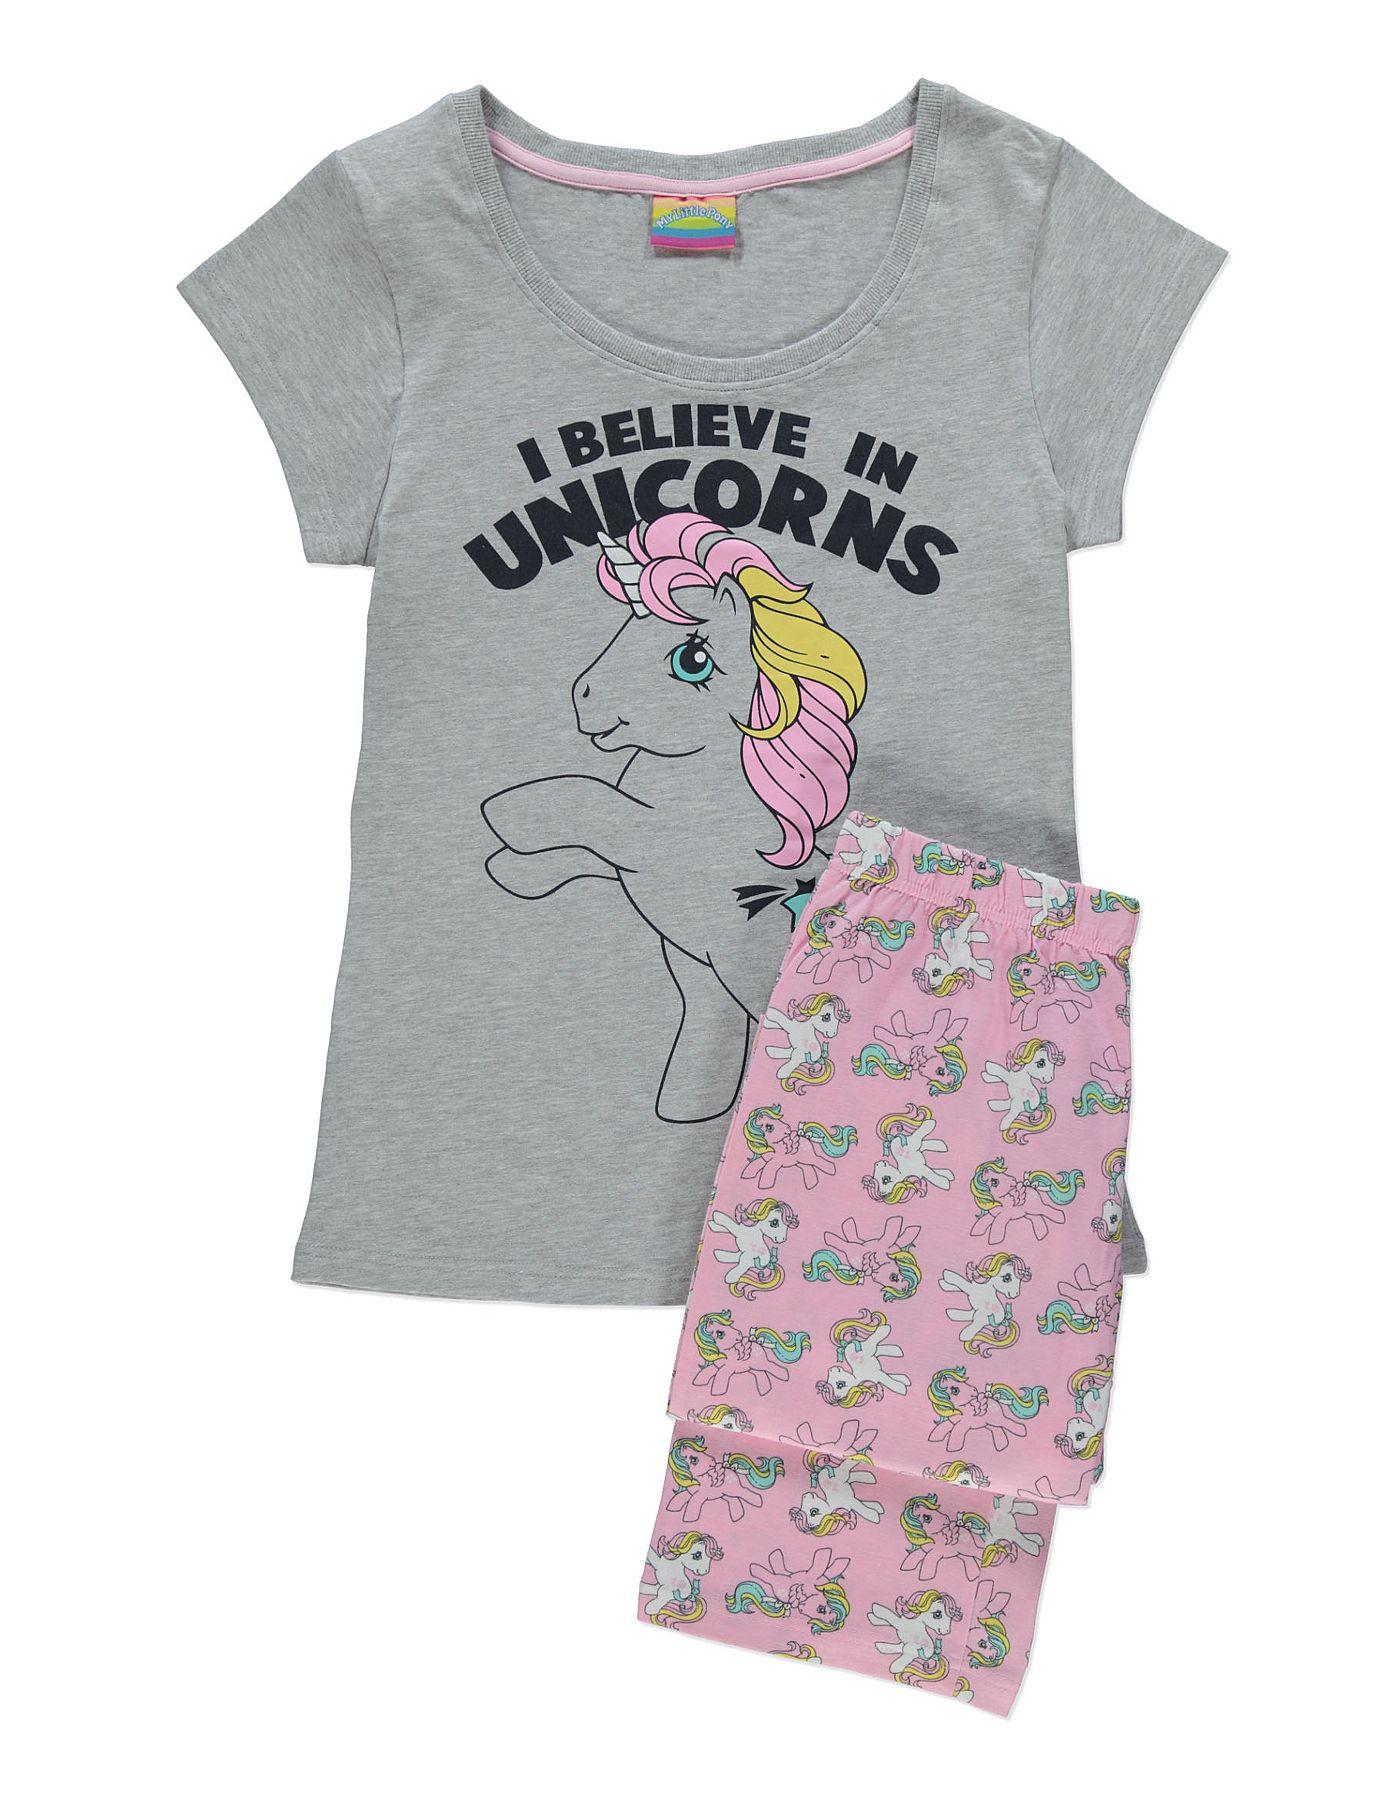 Fingerless gloves asda - My Little Pony Unicorn Pyjamas